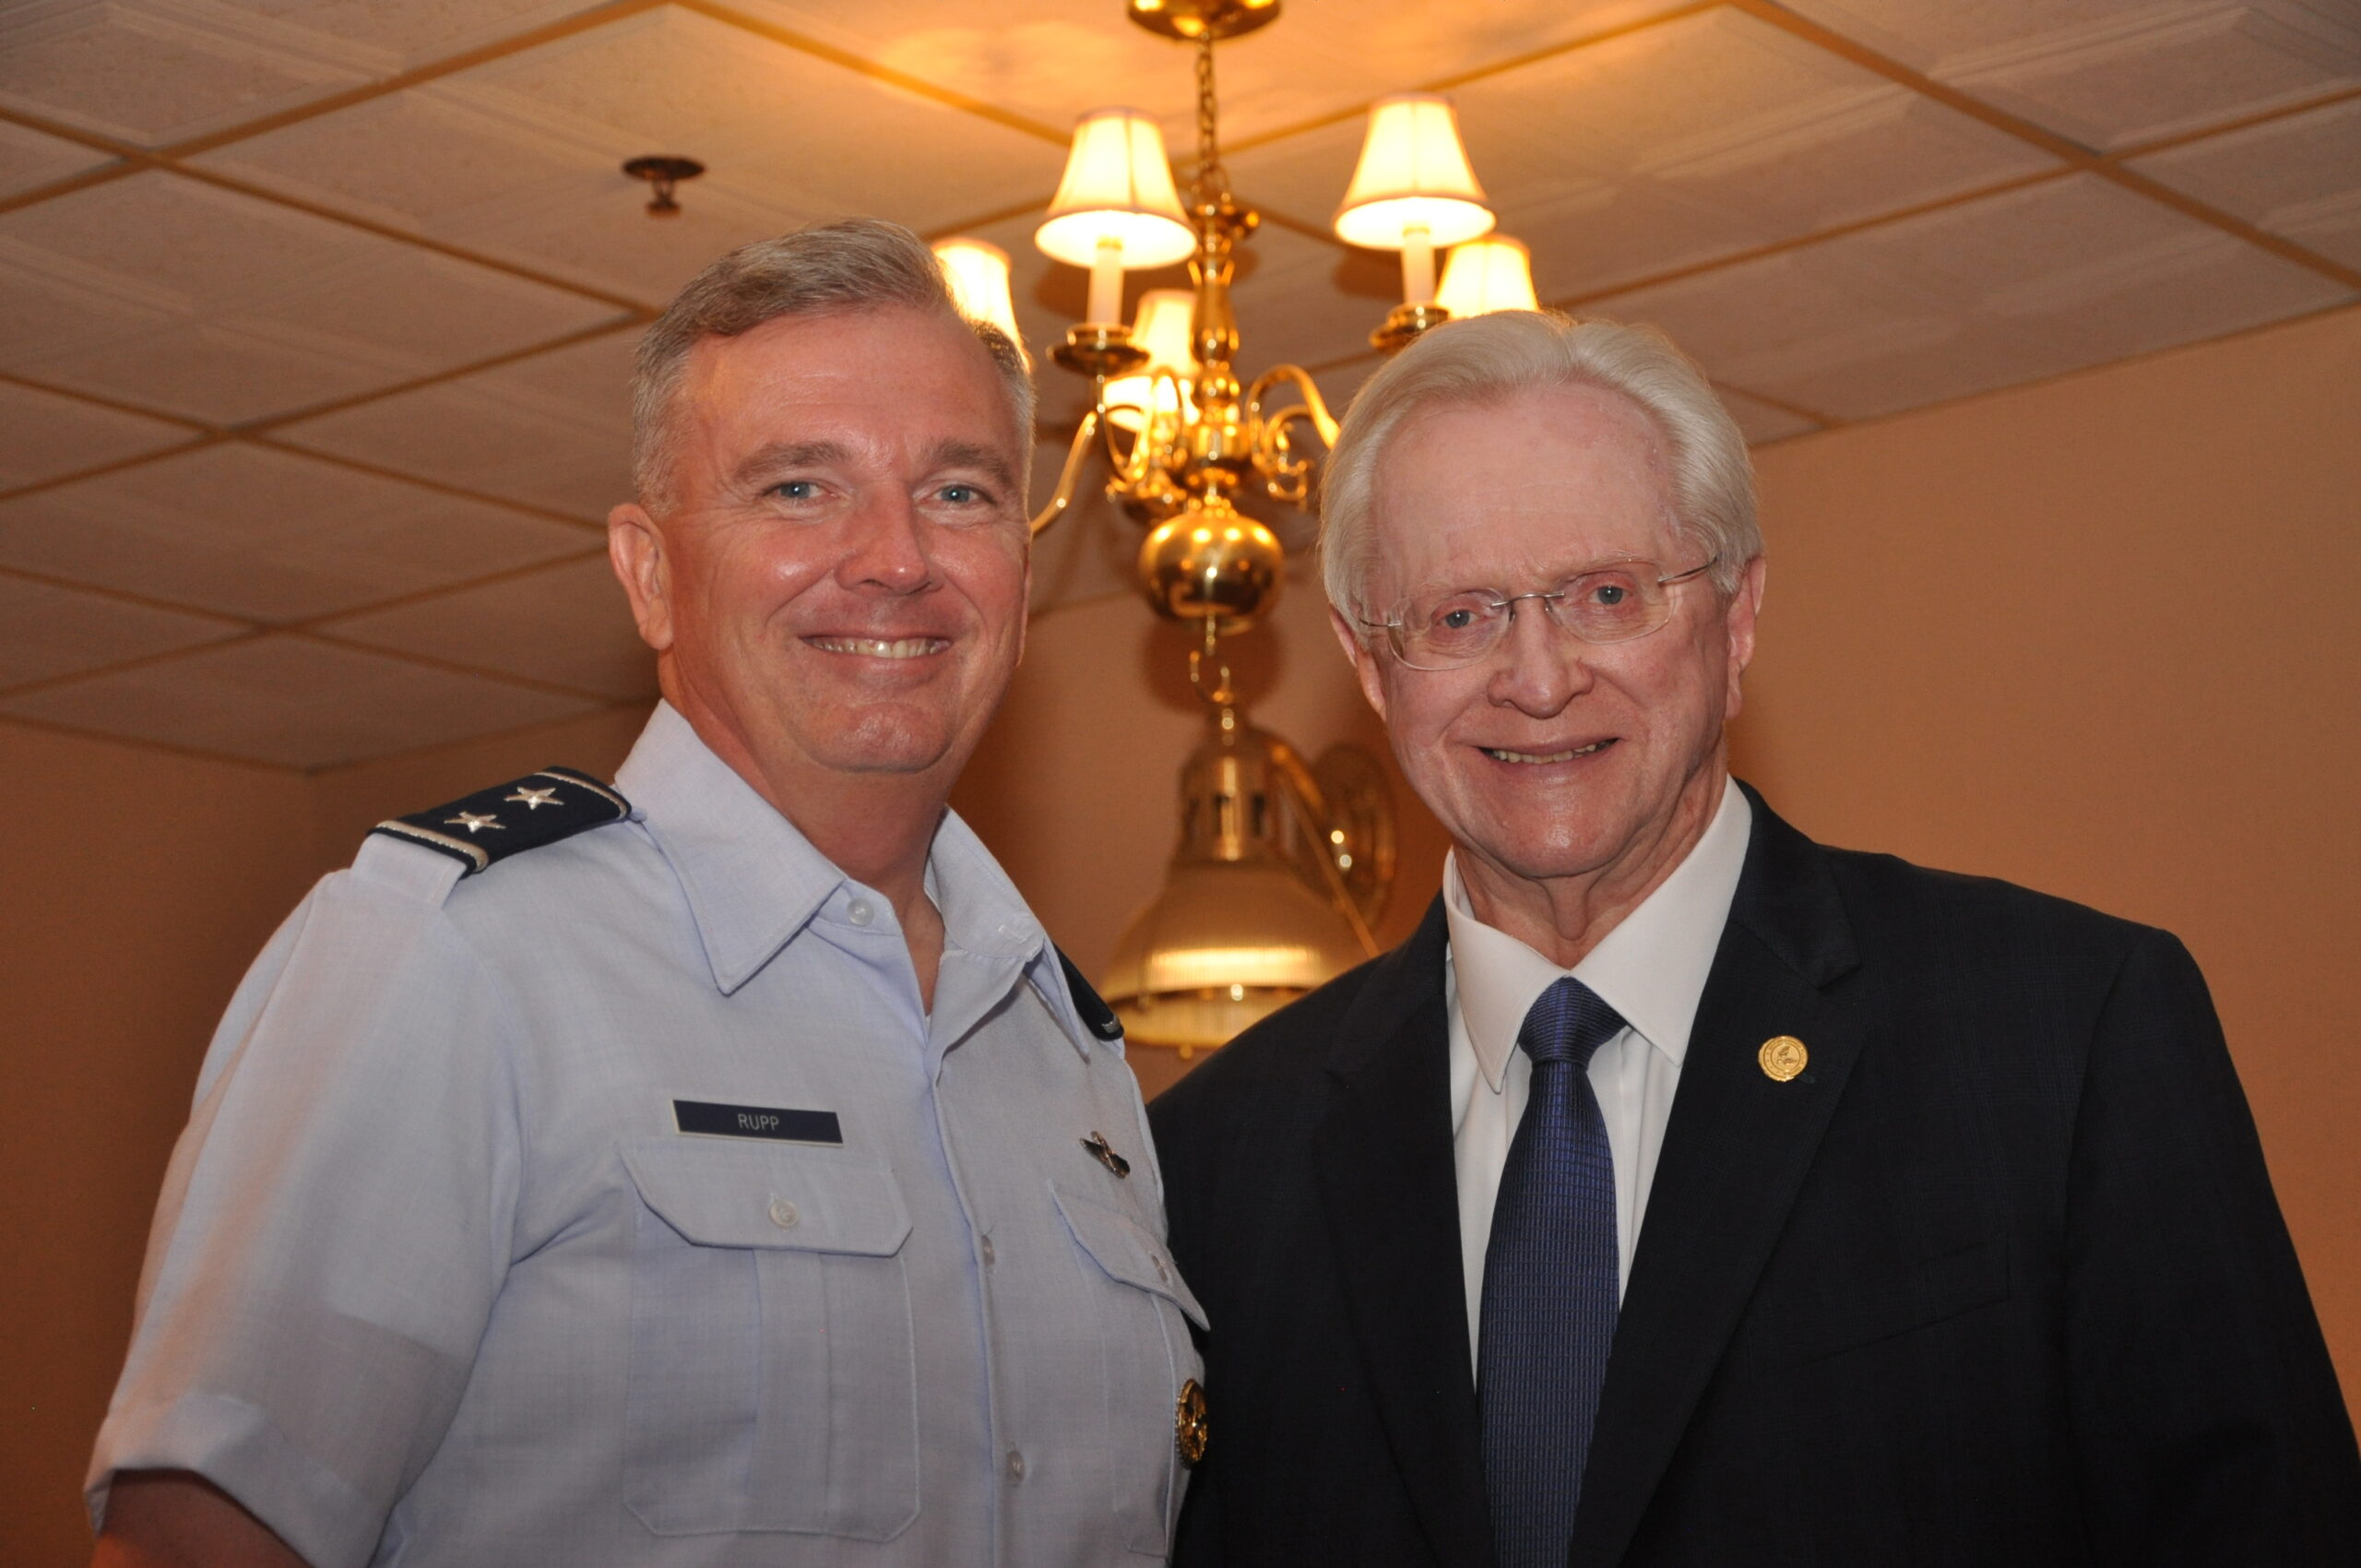 Left to right, Maj. Gen. Ricky Rupp, Commander, Air Force District of Washington, Hon. M.H. Jim Estepp, President & CEO, Andrews Business & Community Alliance